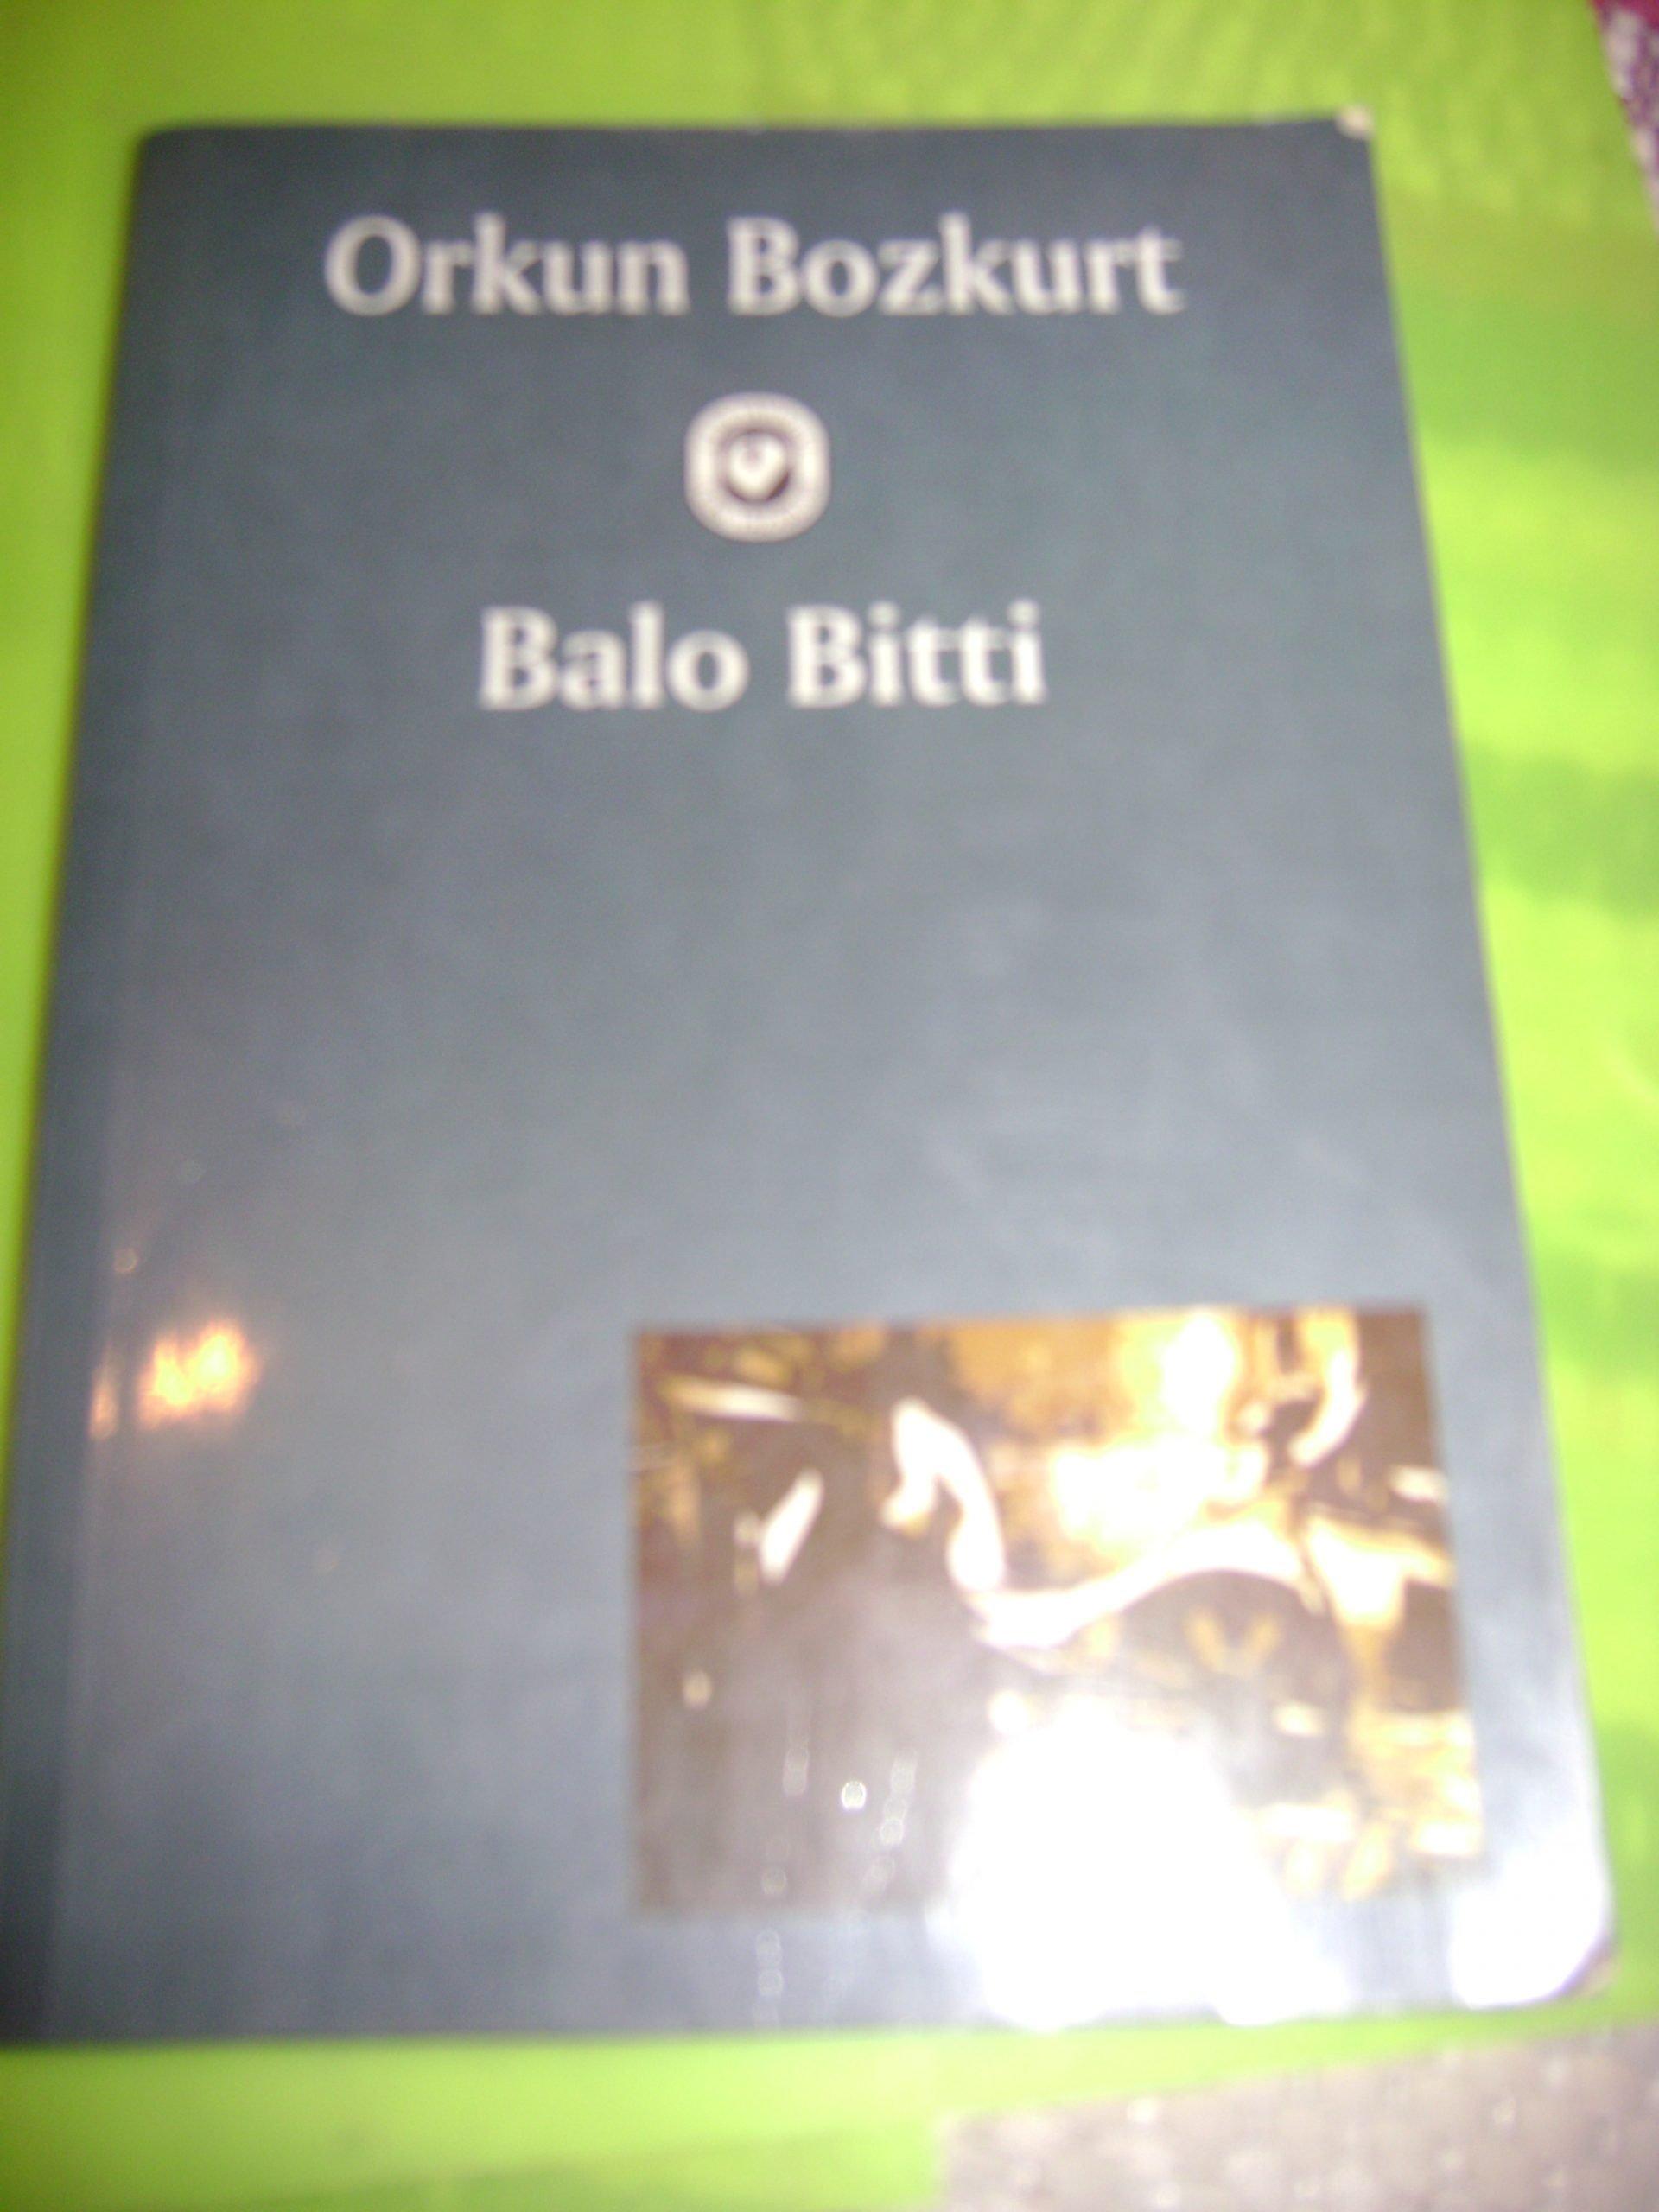 BALO BİTTİ/Orkun BOZKURT/10 TL